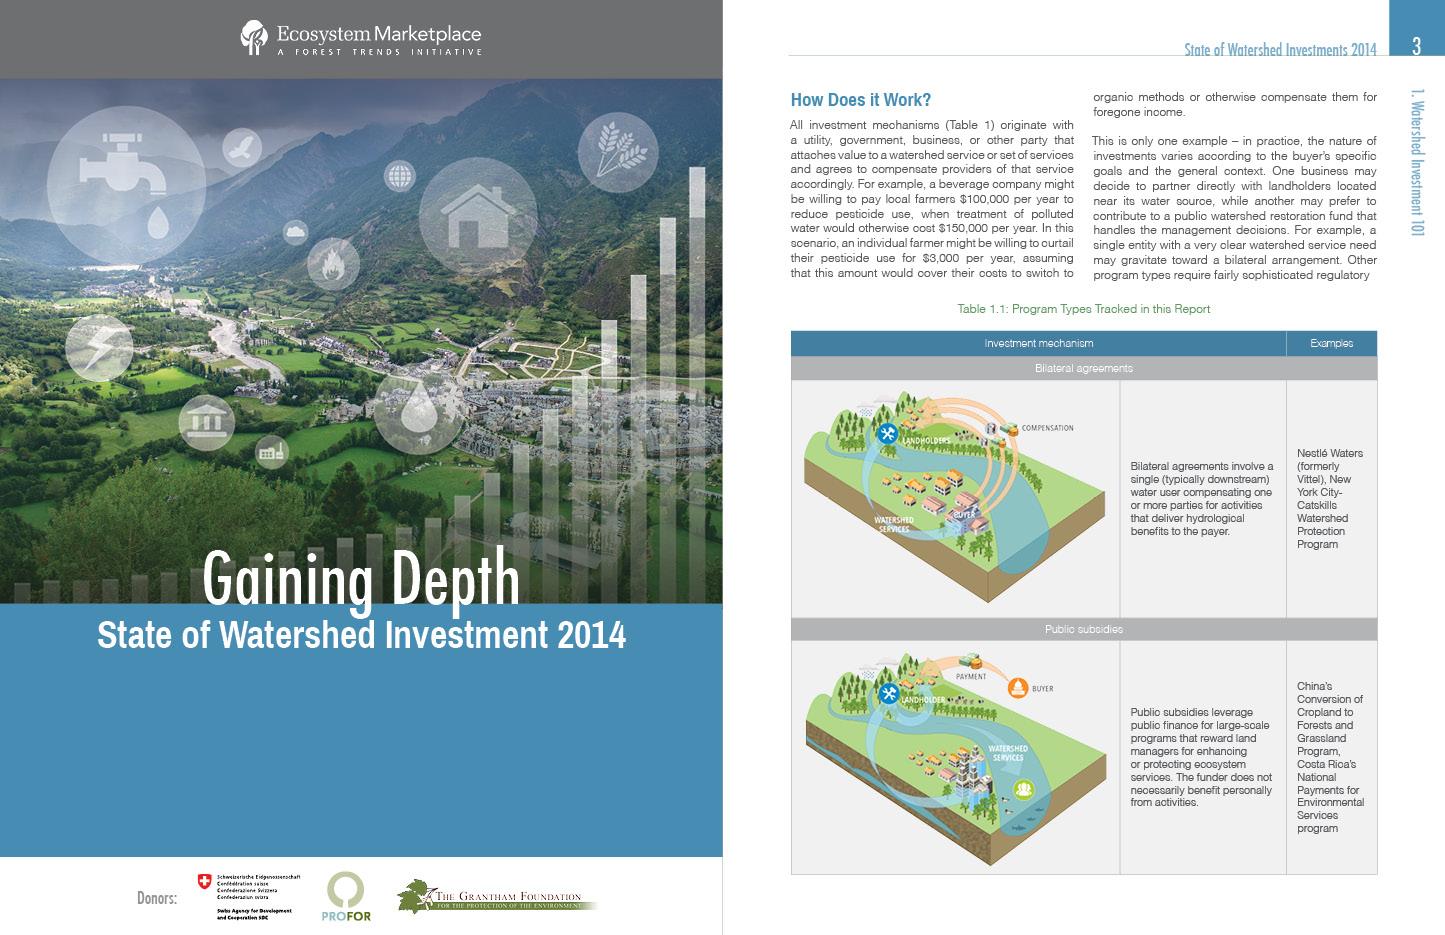 Water Report 2014